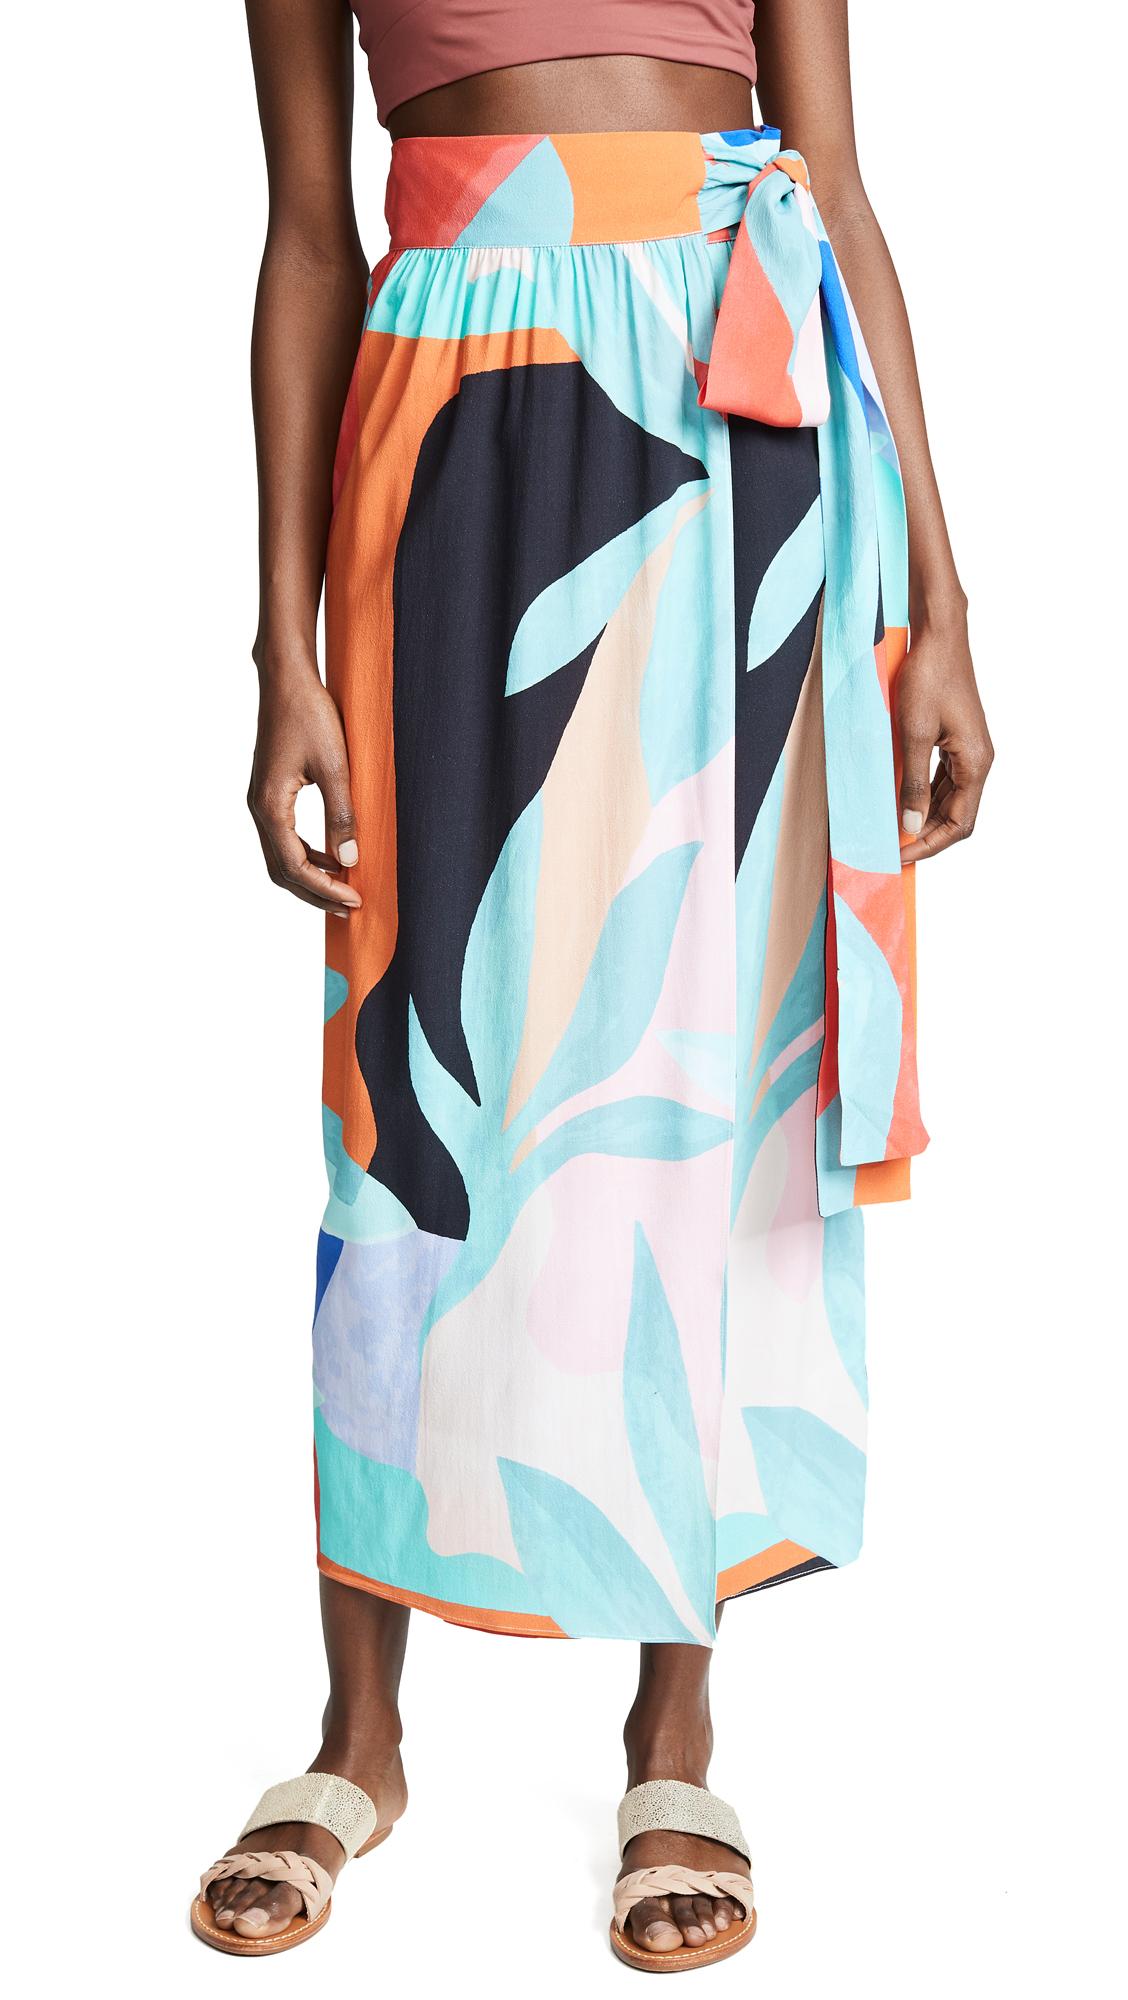 Mara Hoffman Cora Skirt - Black Multi